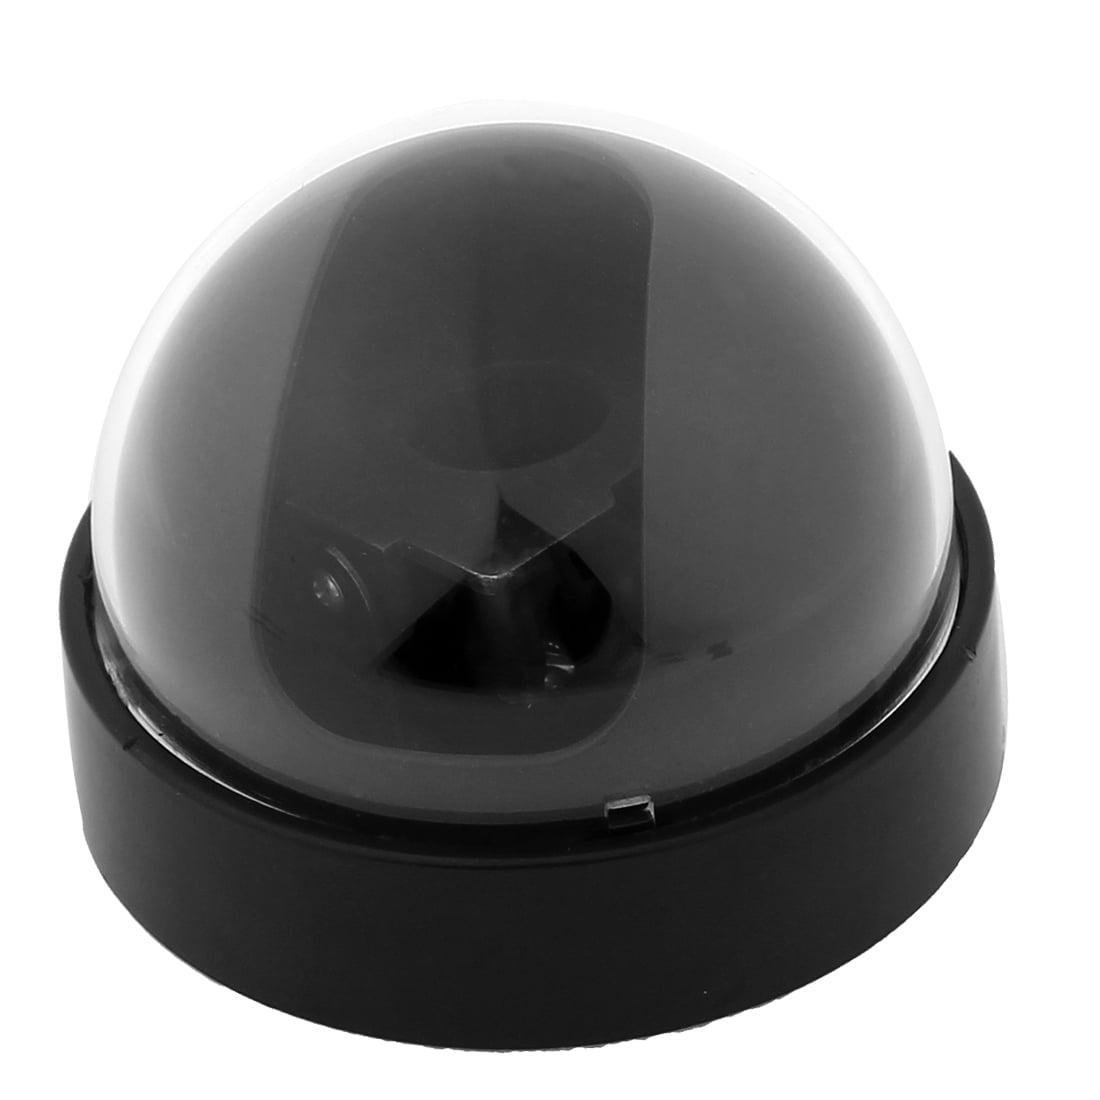 "Black Plastic Surveillance Security CCTV Dome Camera Housing Case 3.5"" Dia"